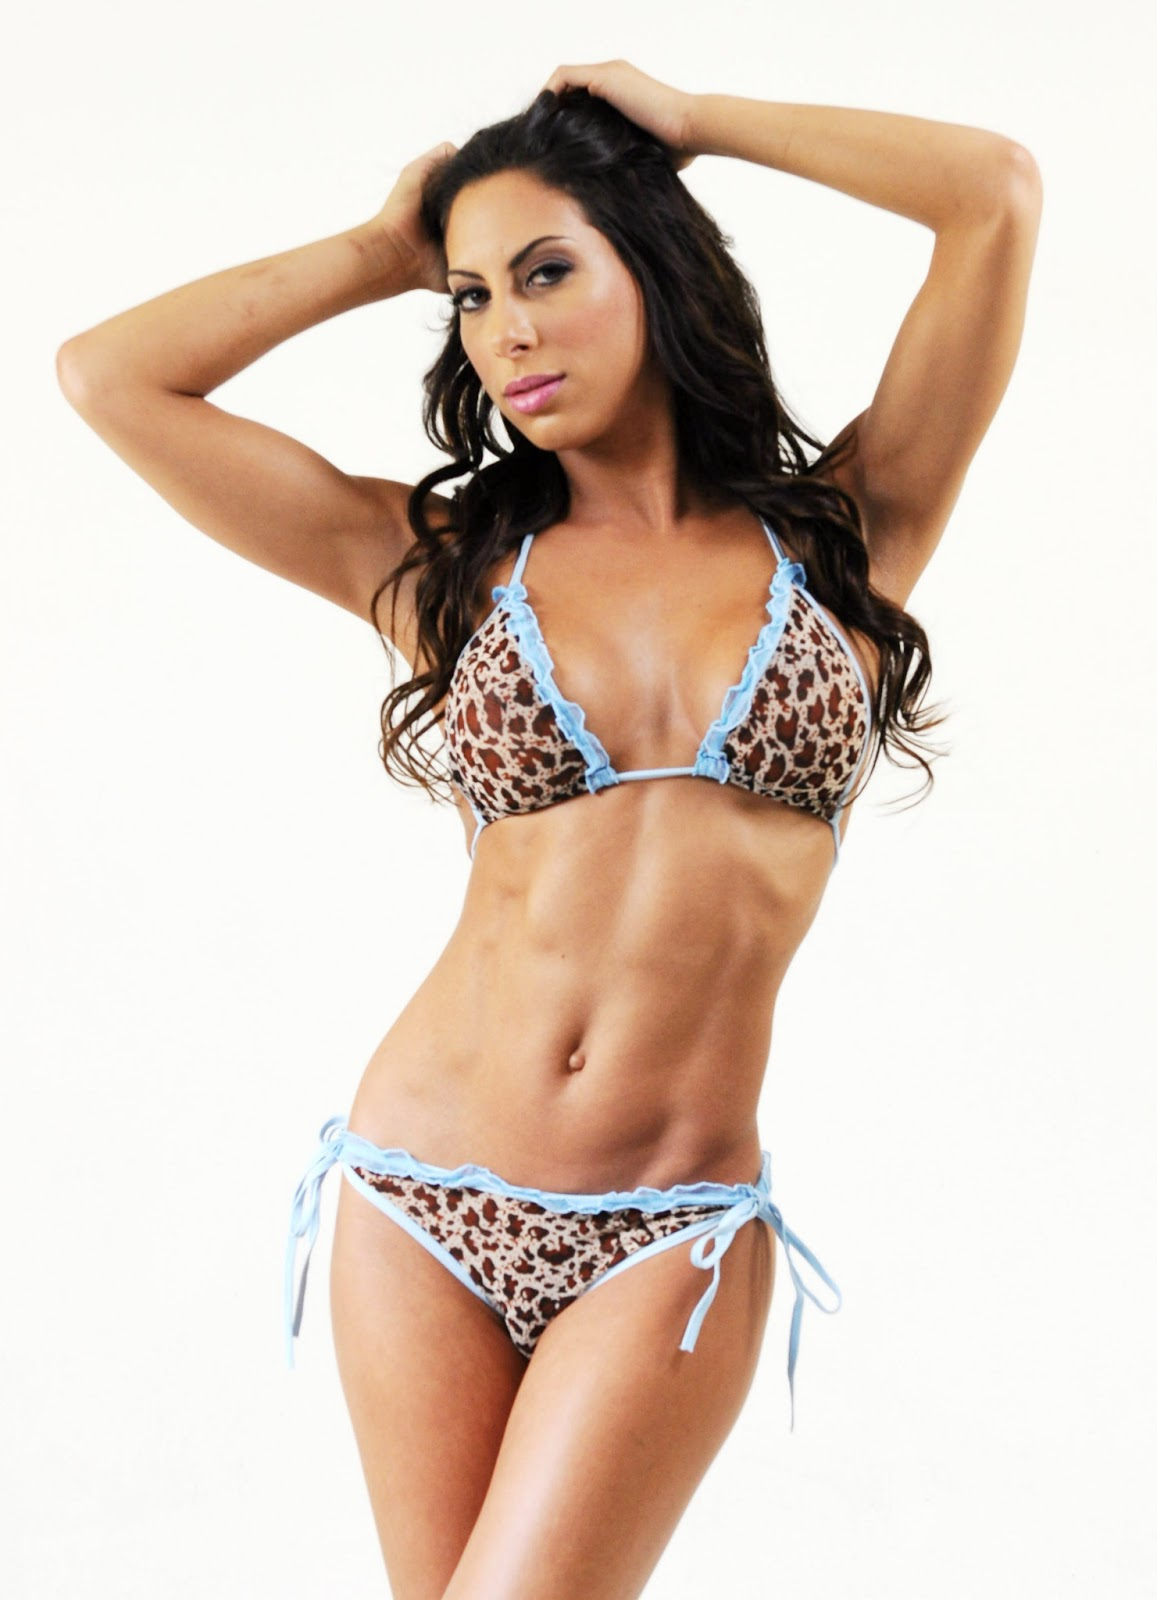 Sandra-mod nude sexy toons